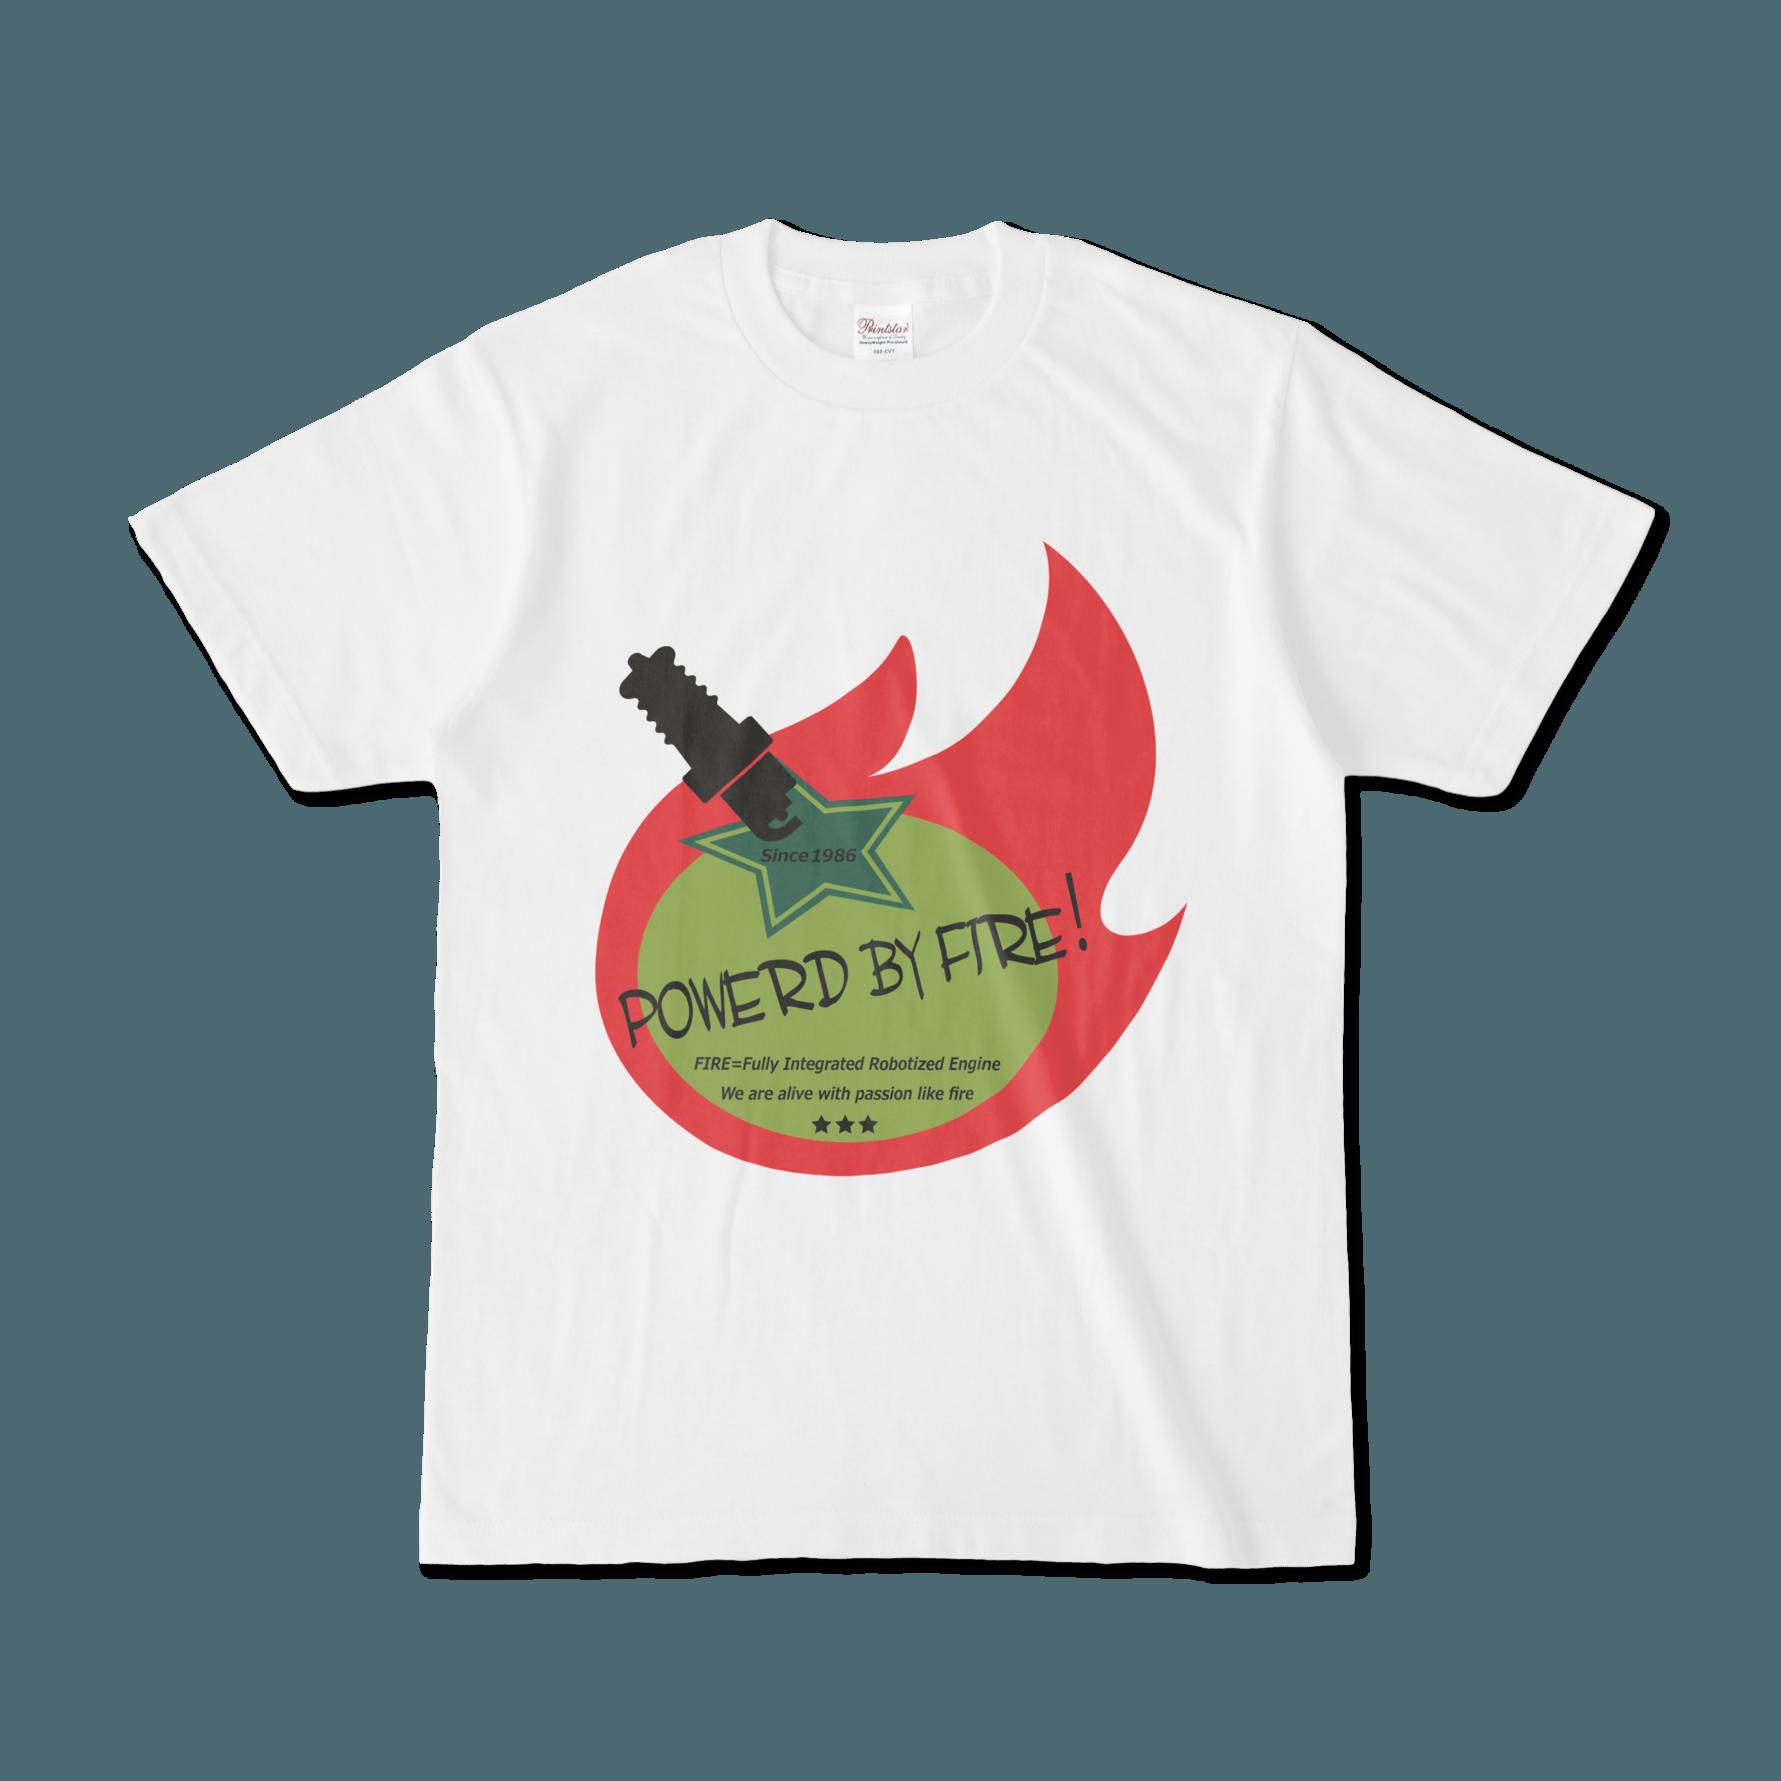 Powerd by fire デザインTシャツ(トリコローレ)